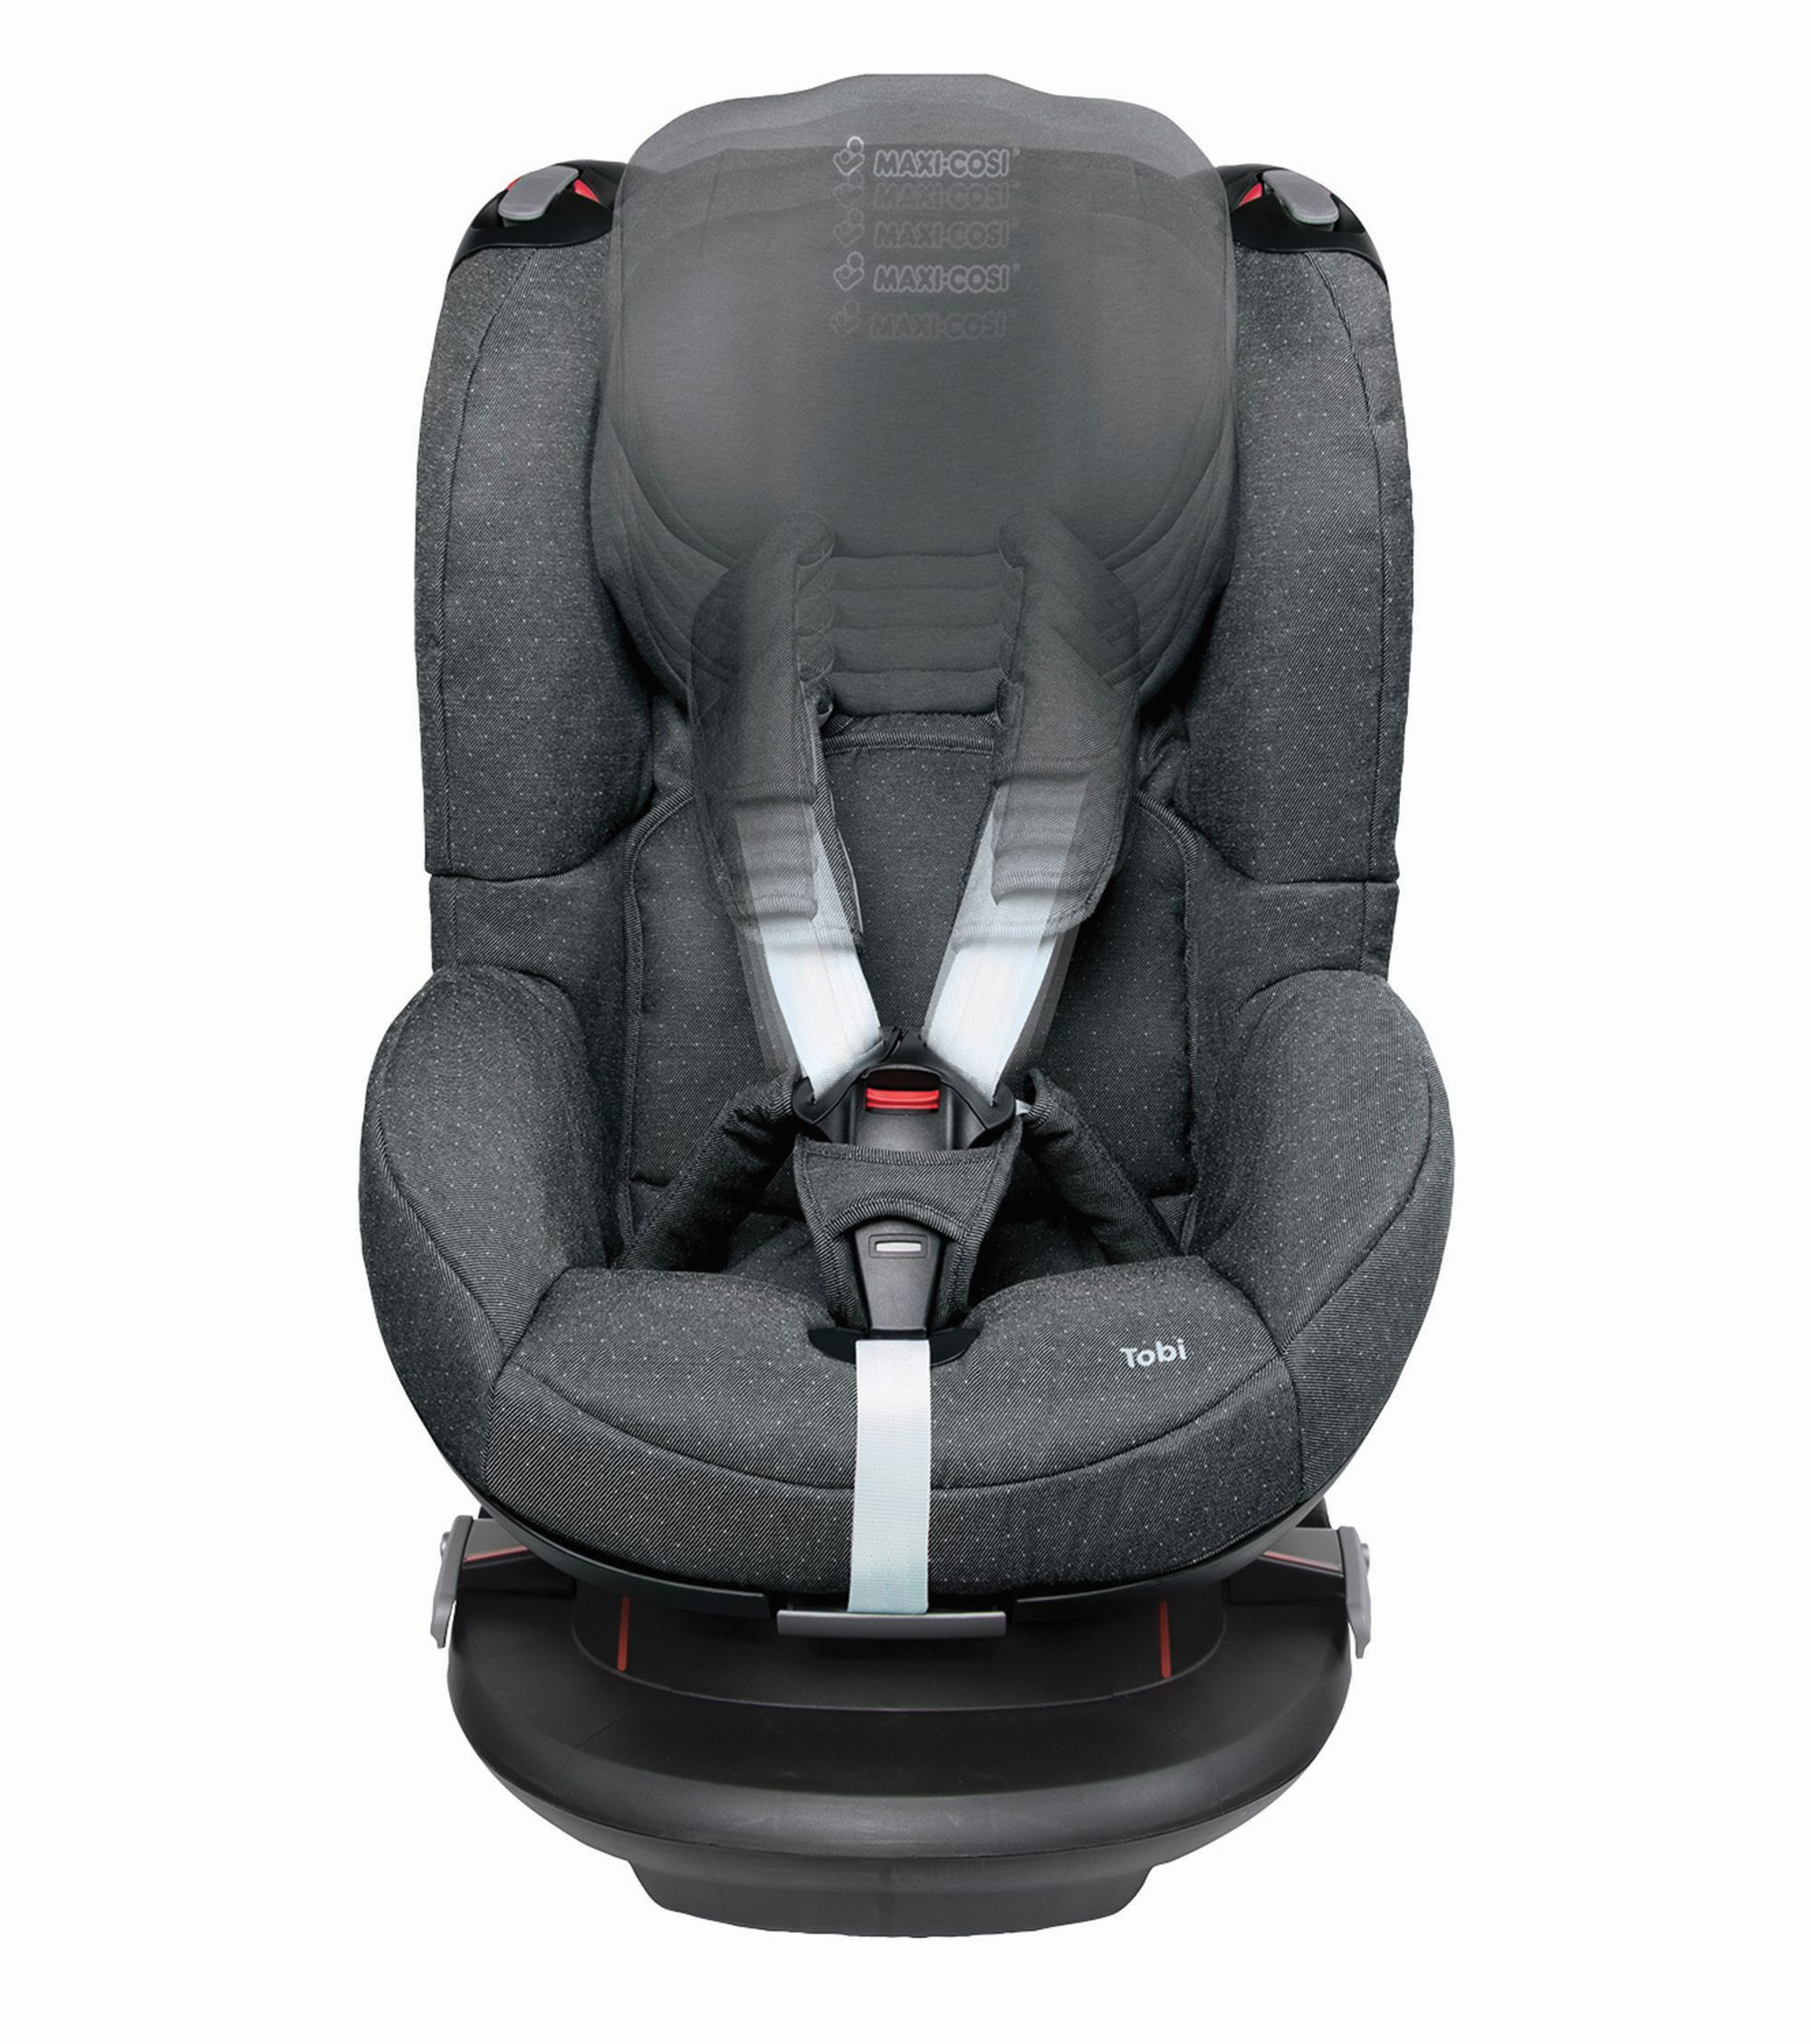 maxi cosi child car seat tobi 2018 sparkling grey buy at kidsroom car seats. Black Bedroom Furniture Sets. Home Design Ideas